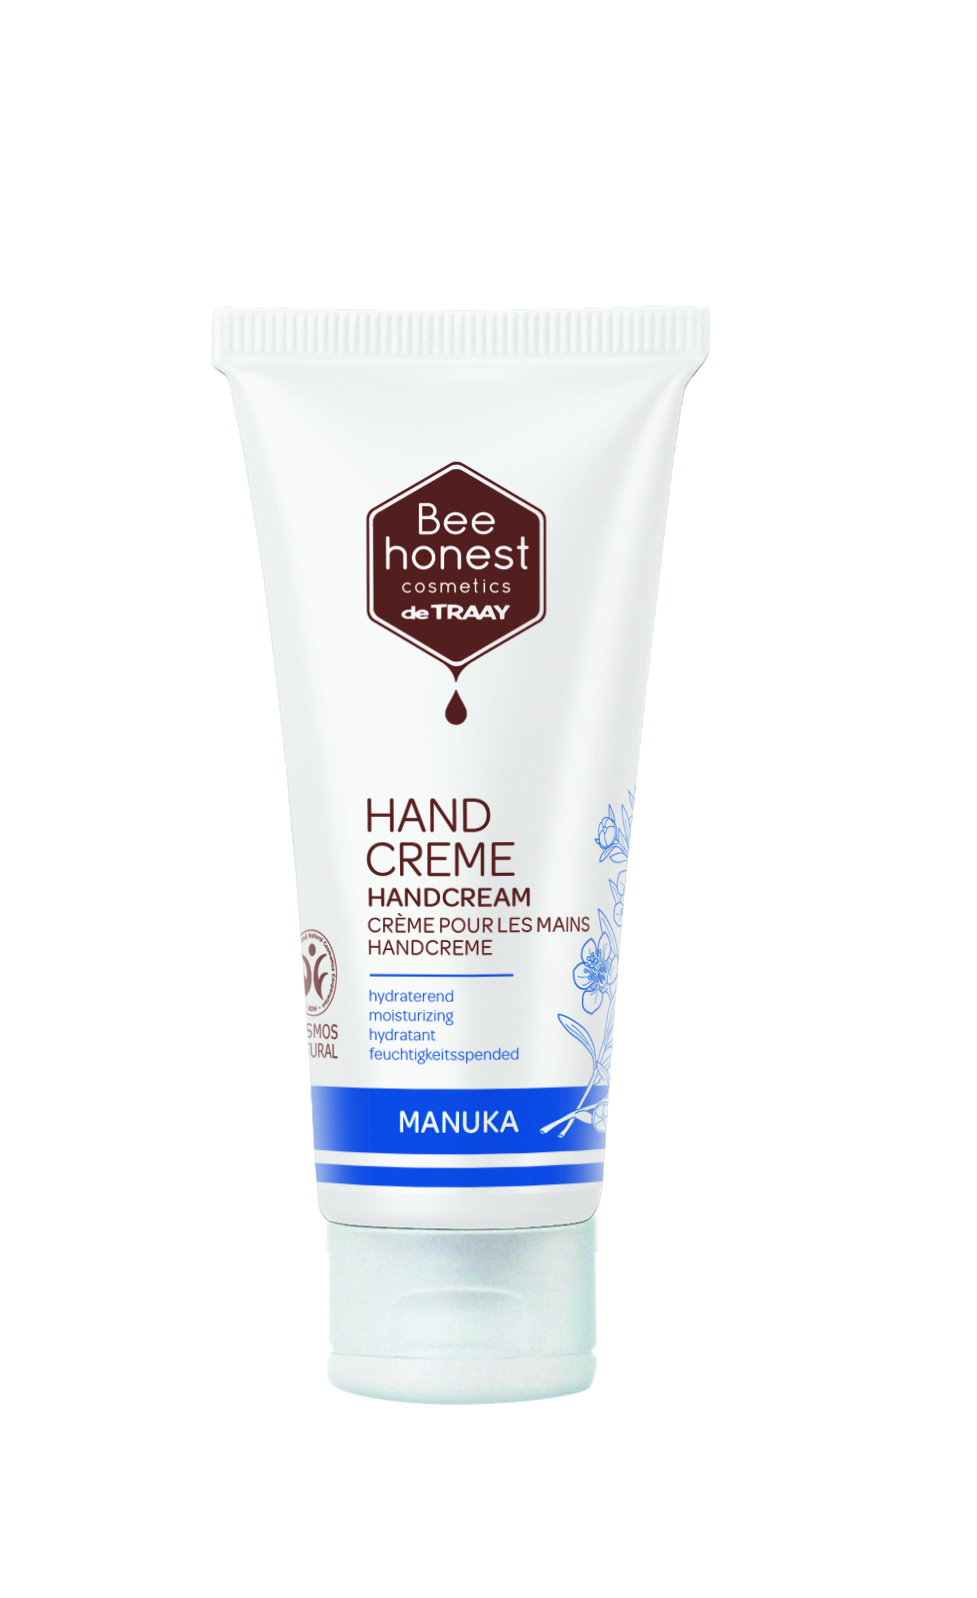 Manuka handcream